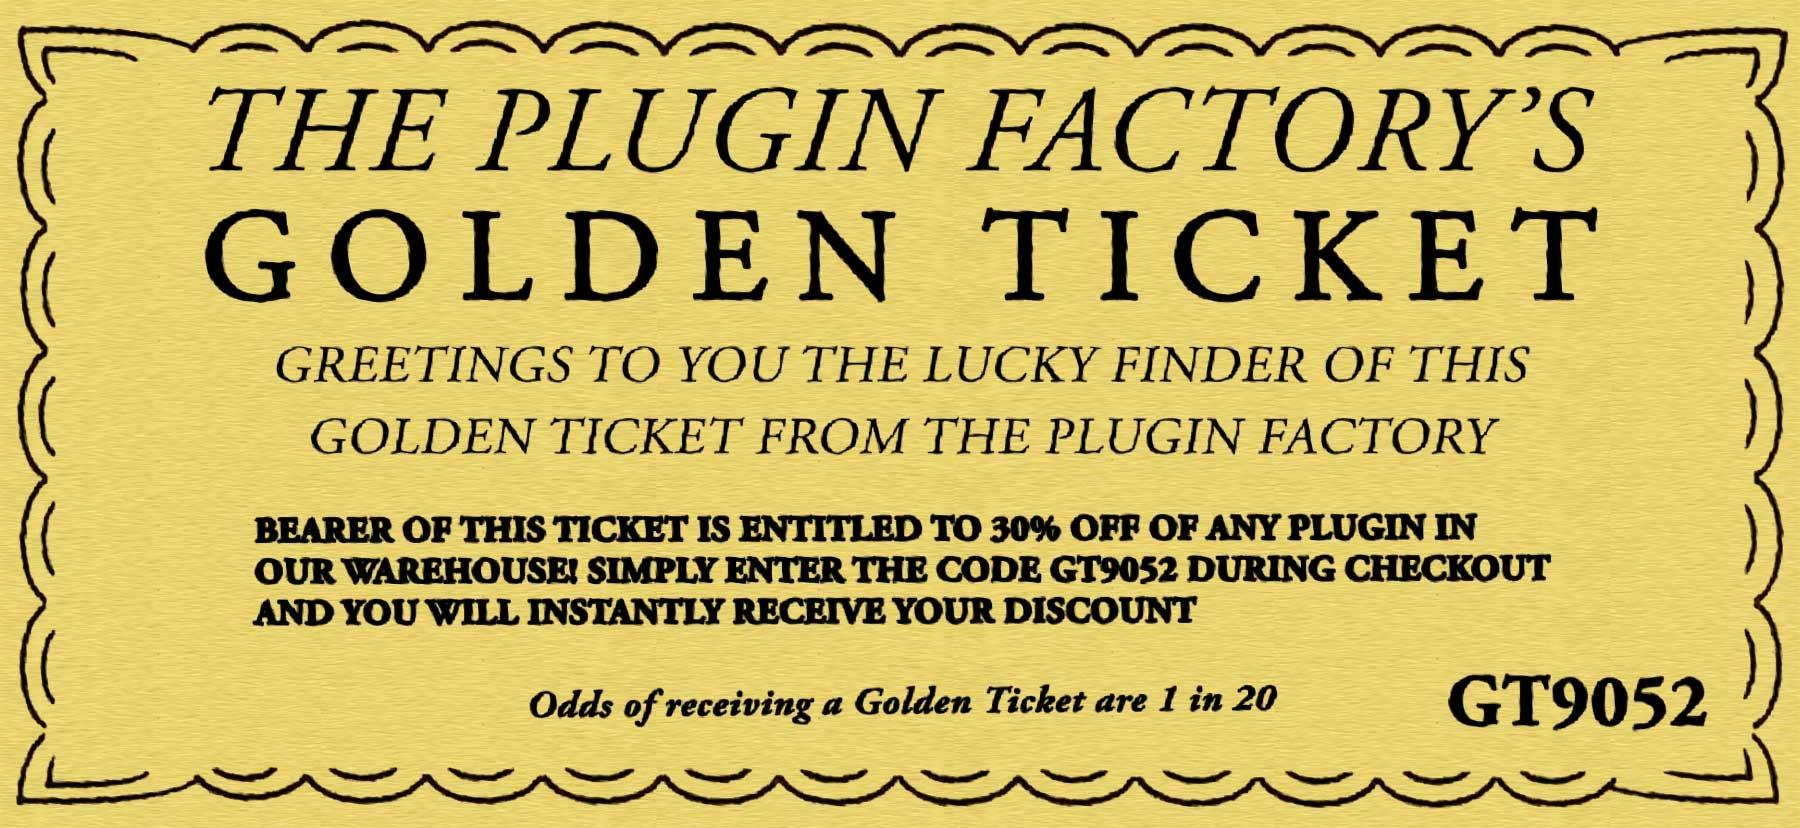 8 Golden Ticket Templates - Find Word Templates - Golden Ticket Printable Free